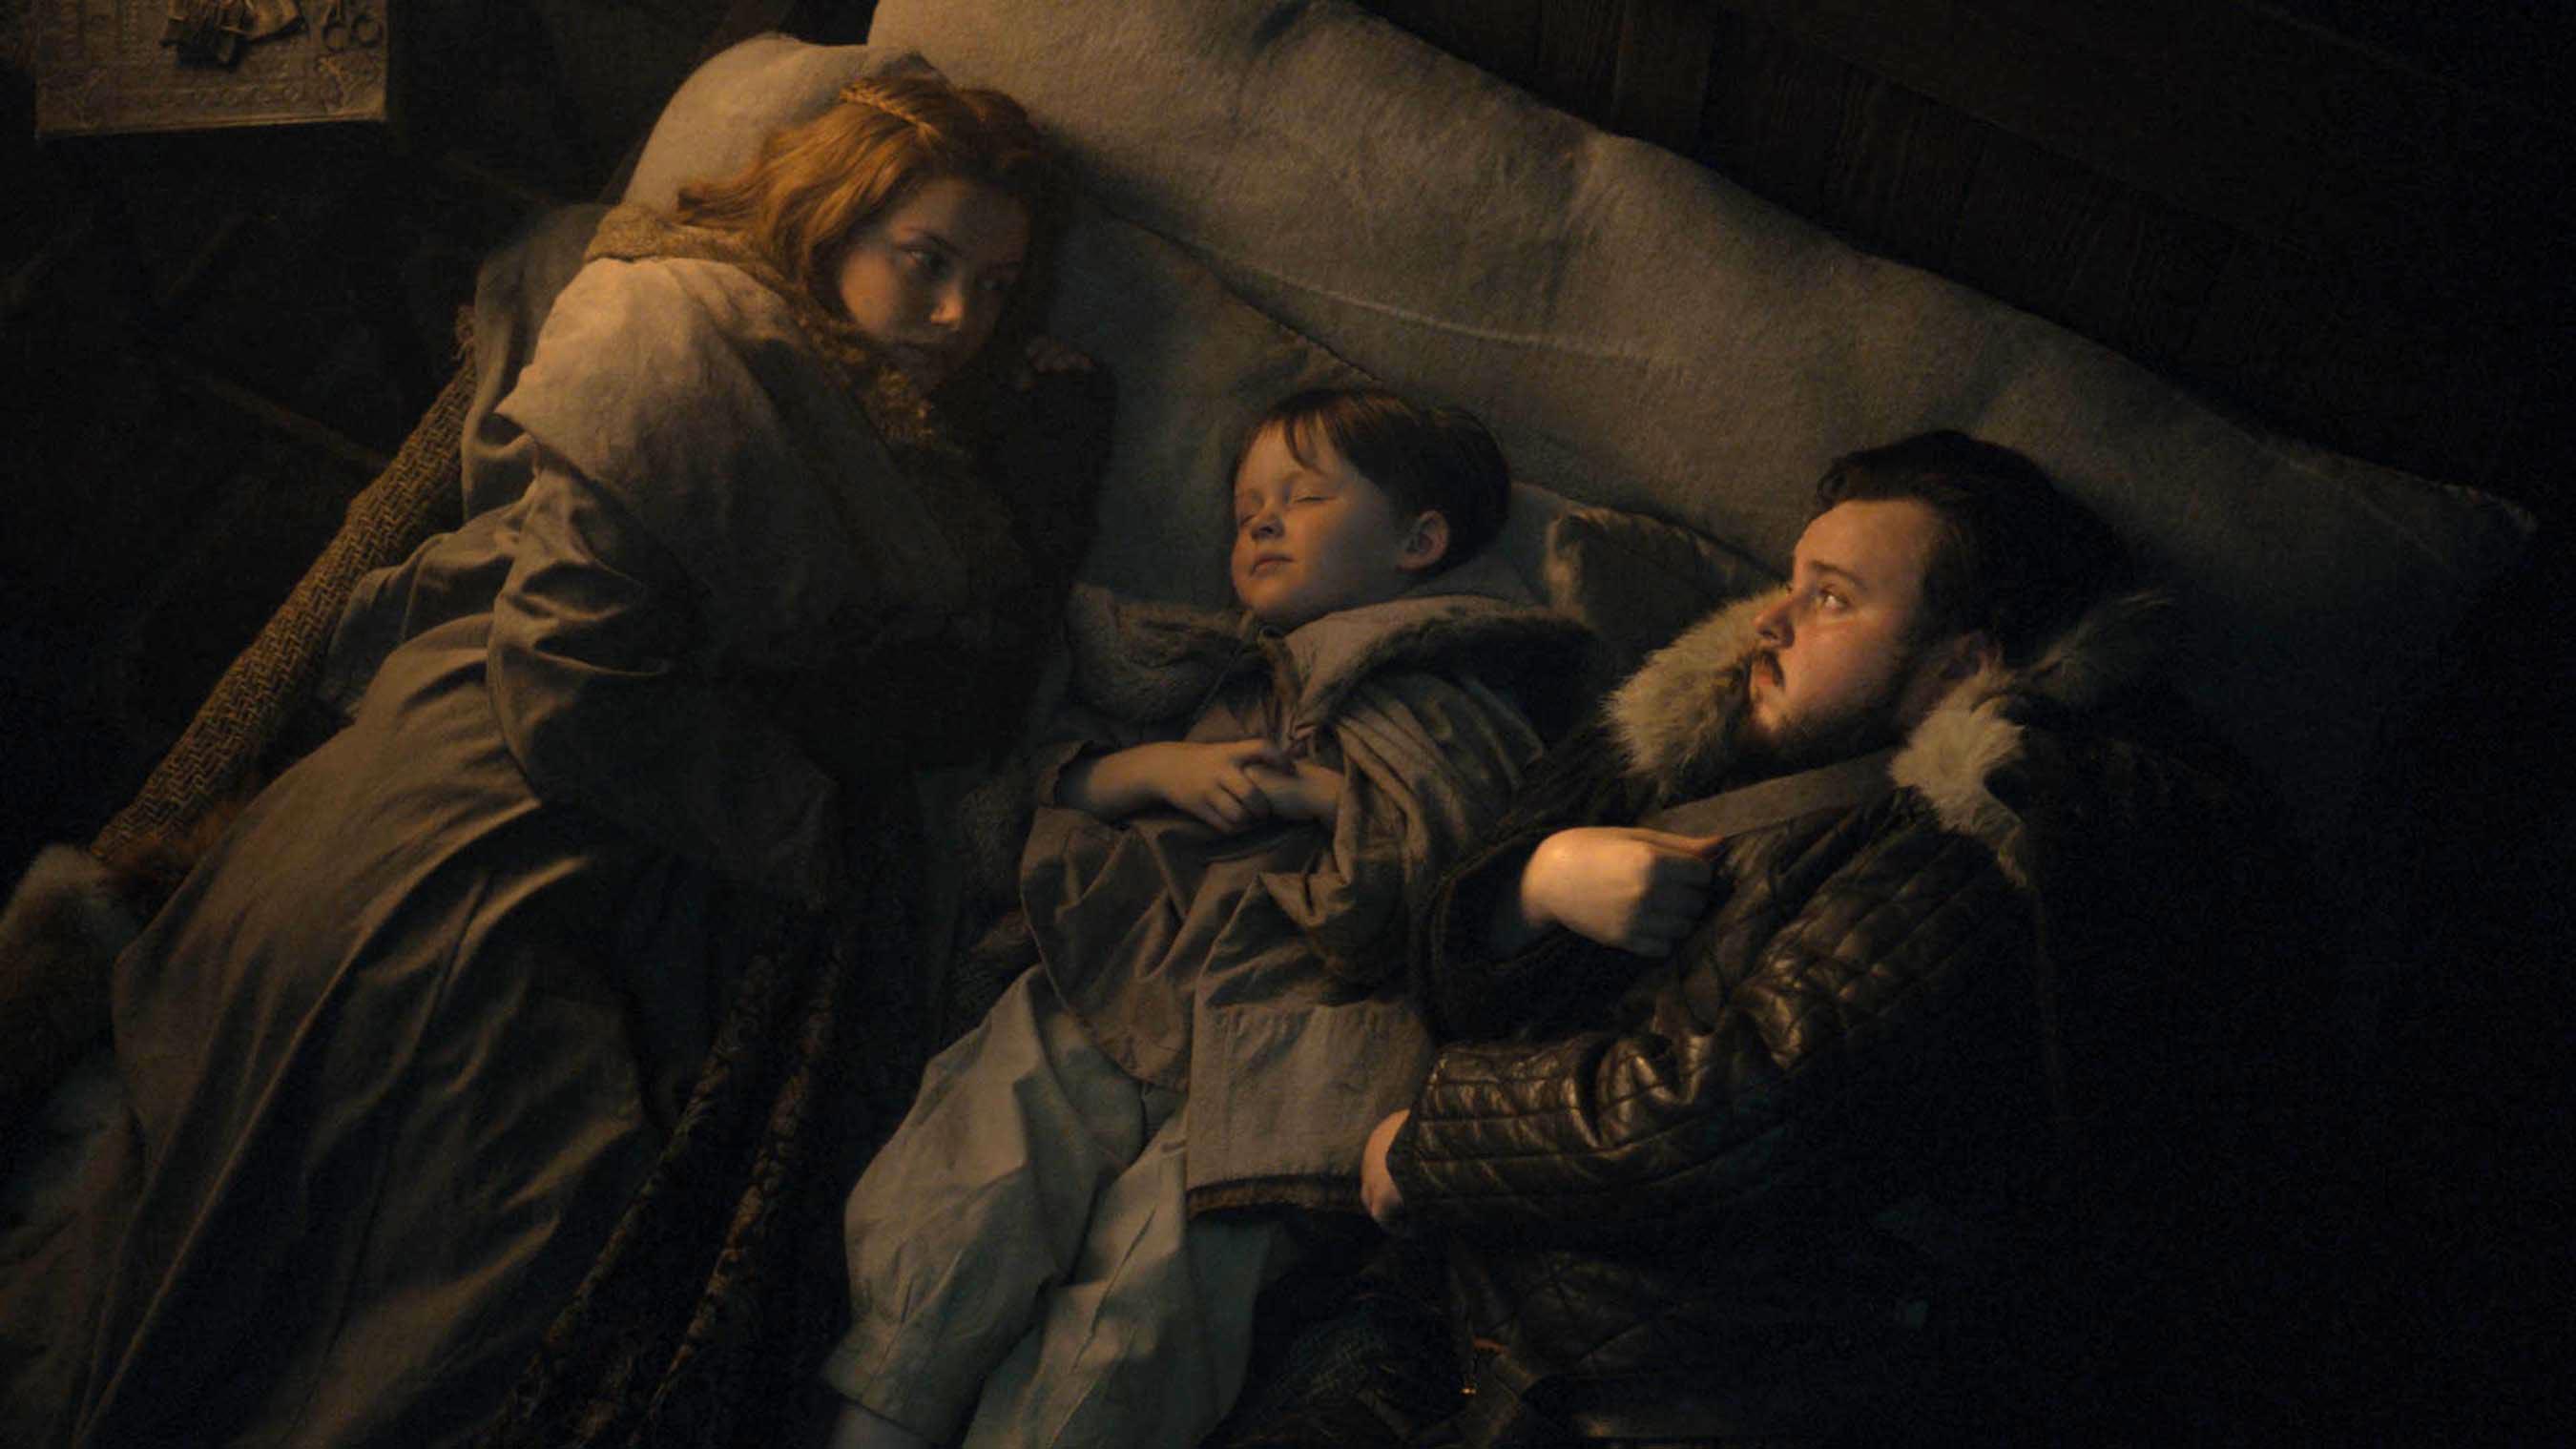 Game of Thrones 8x02 - GOT Temporada 8 Episodio 2 Carlost.net